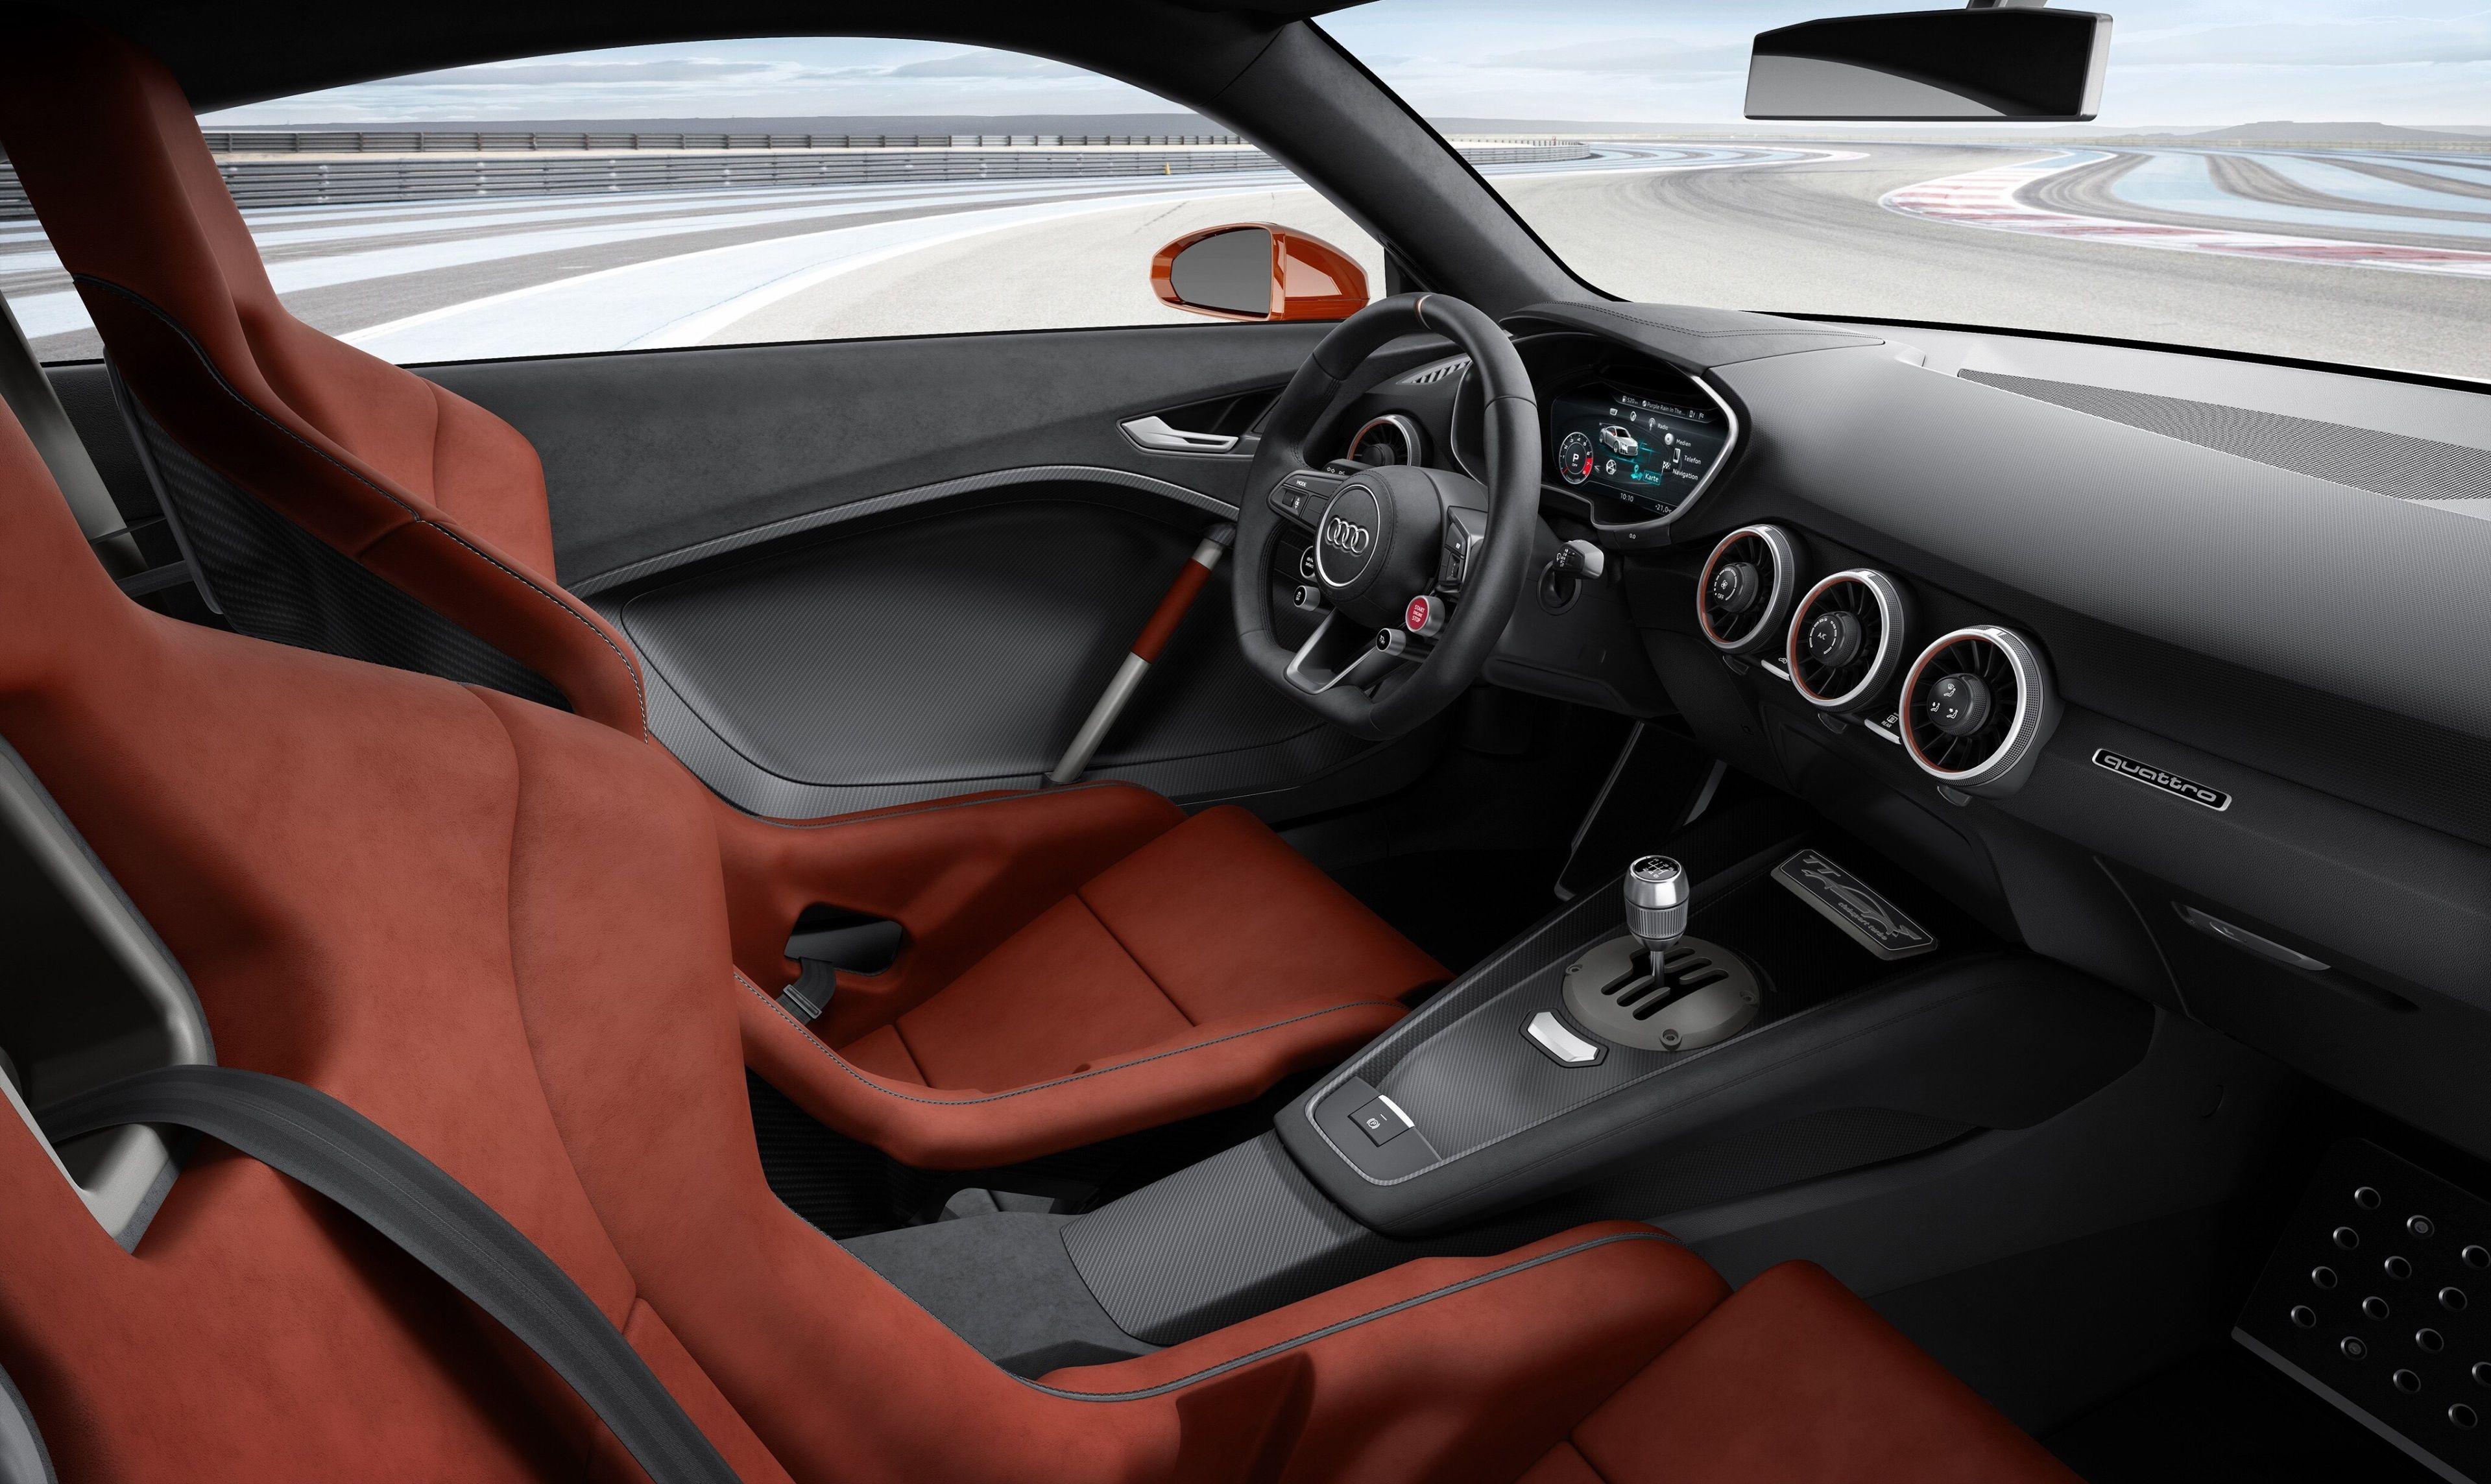 ea06672e2b881216cb3b5915b4b2d01f Stunning Ficha Tecnica Porsche 918 Spyder Concept Cars Trend